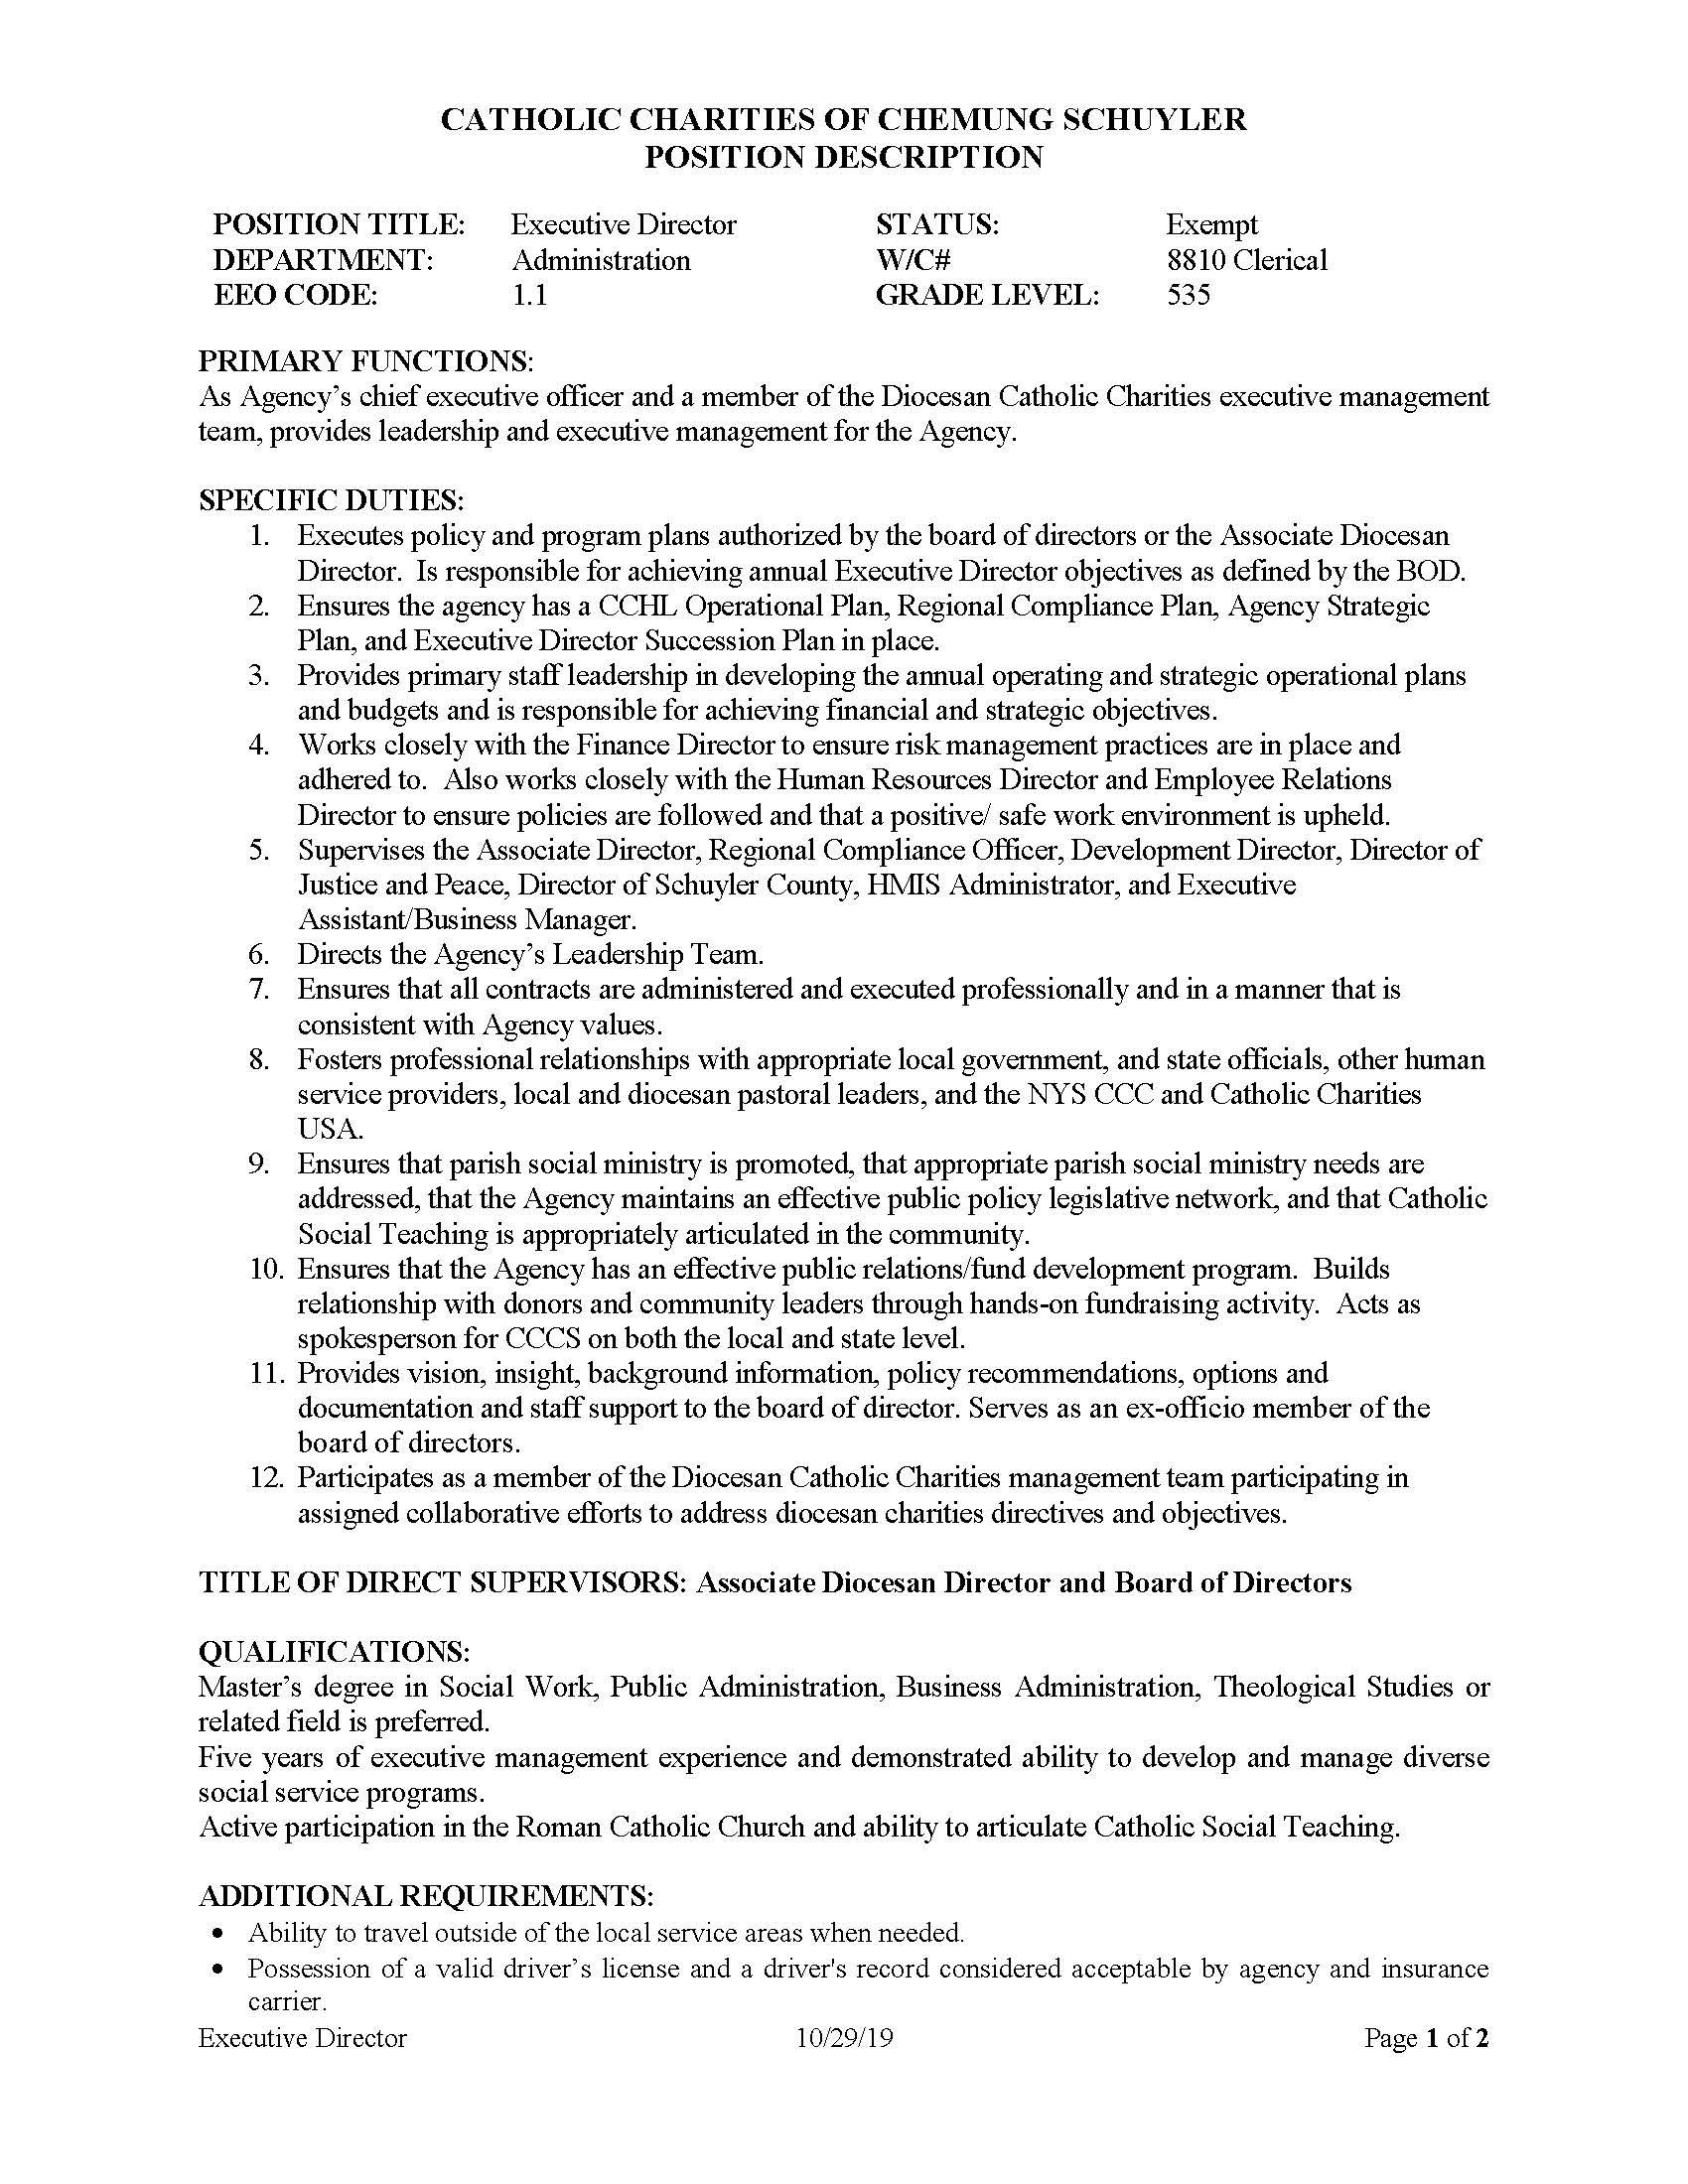 Executive Director Page 1 - Job Post: Catholic Charities of Chemung/Schuyler Executive Director